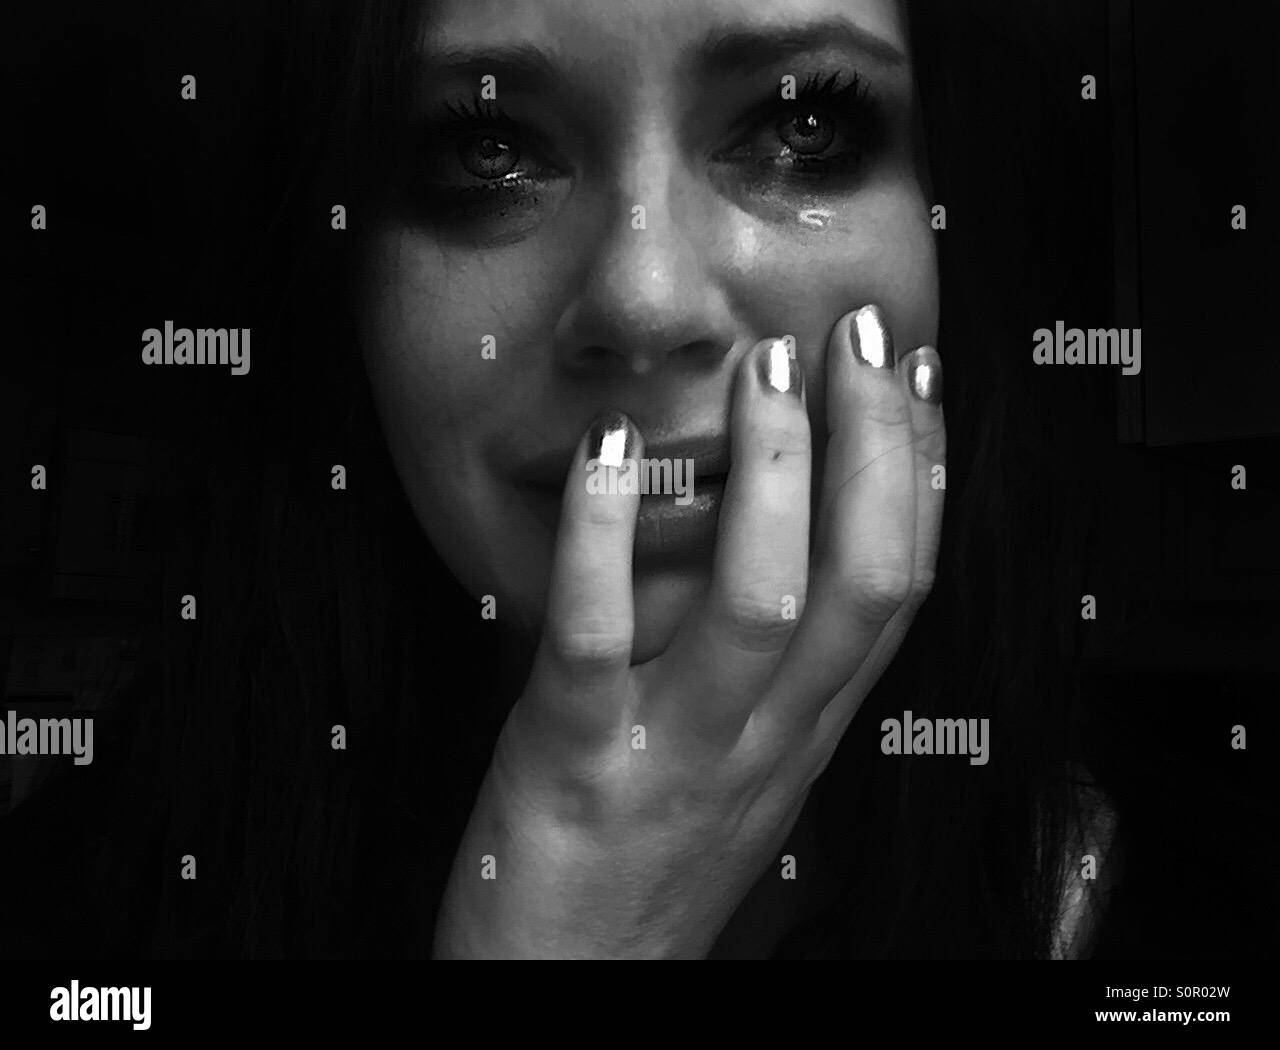 Black and white closeup of woman crying · dreamerjl83 stockimo alamy stock photo